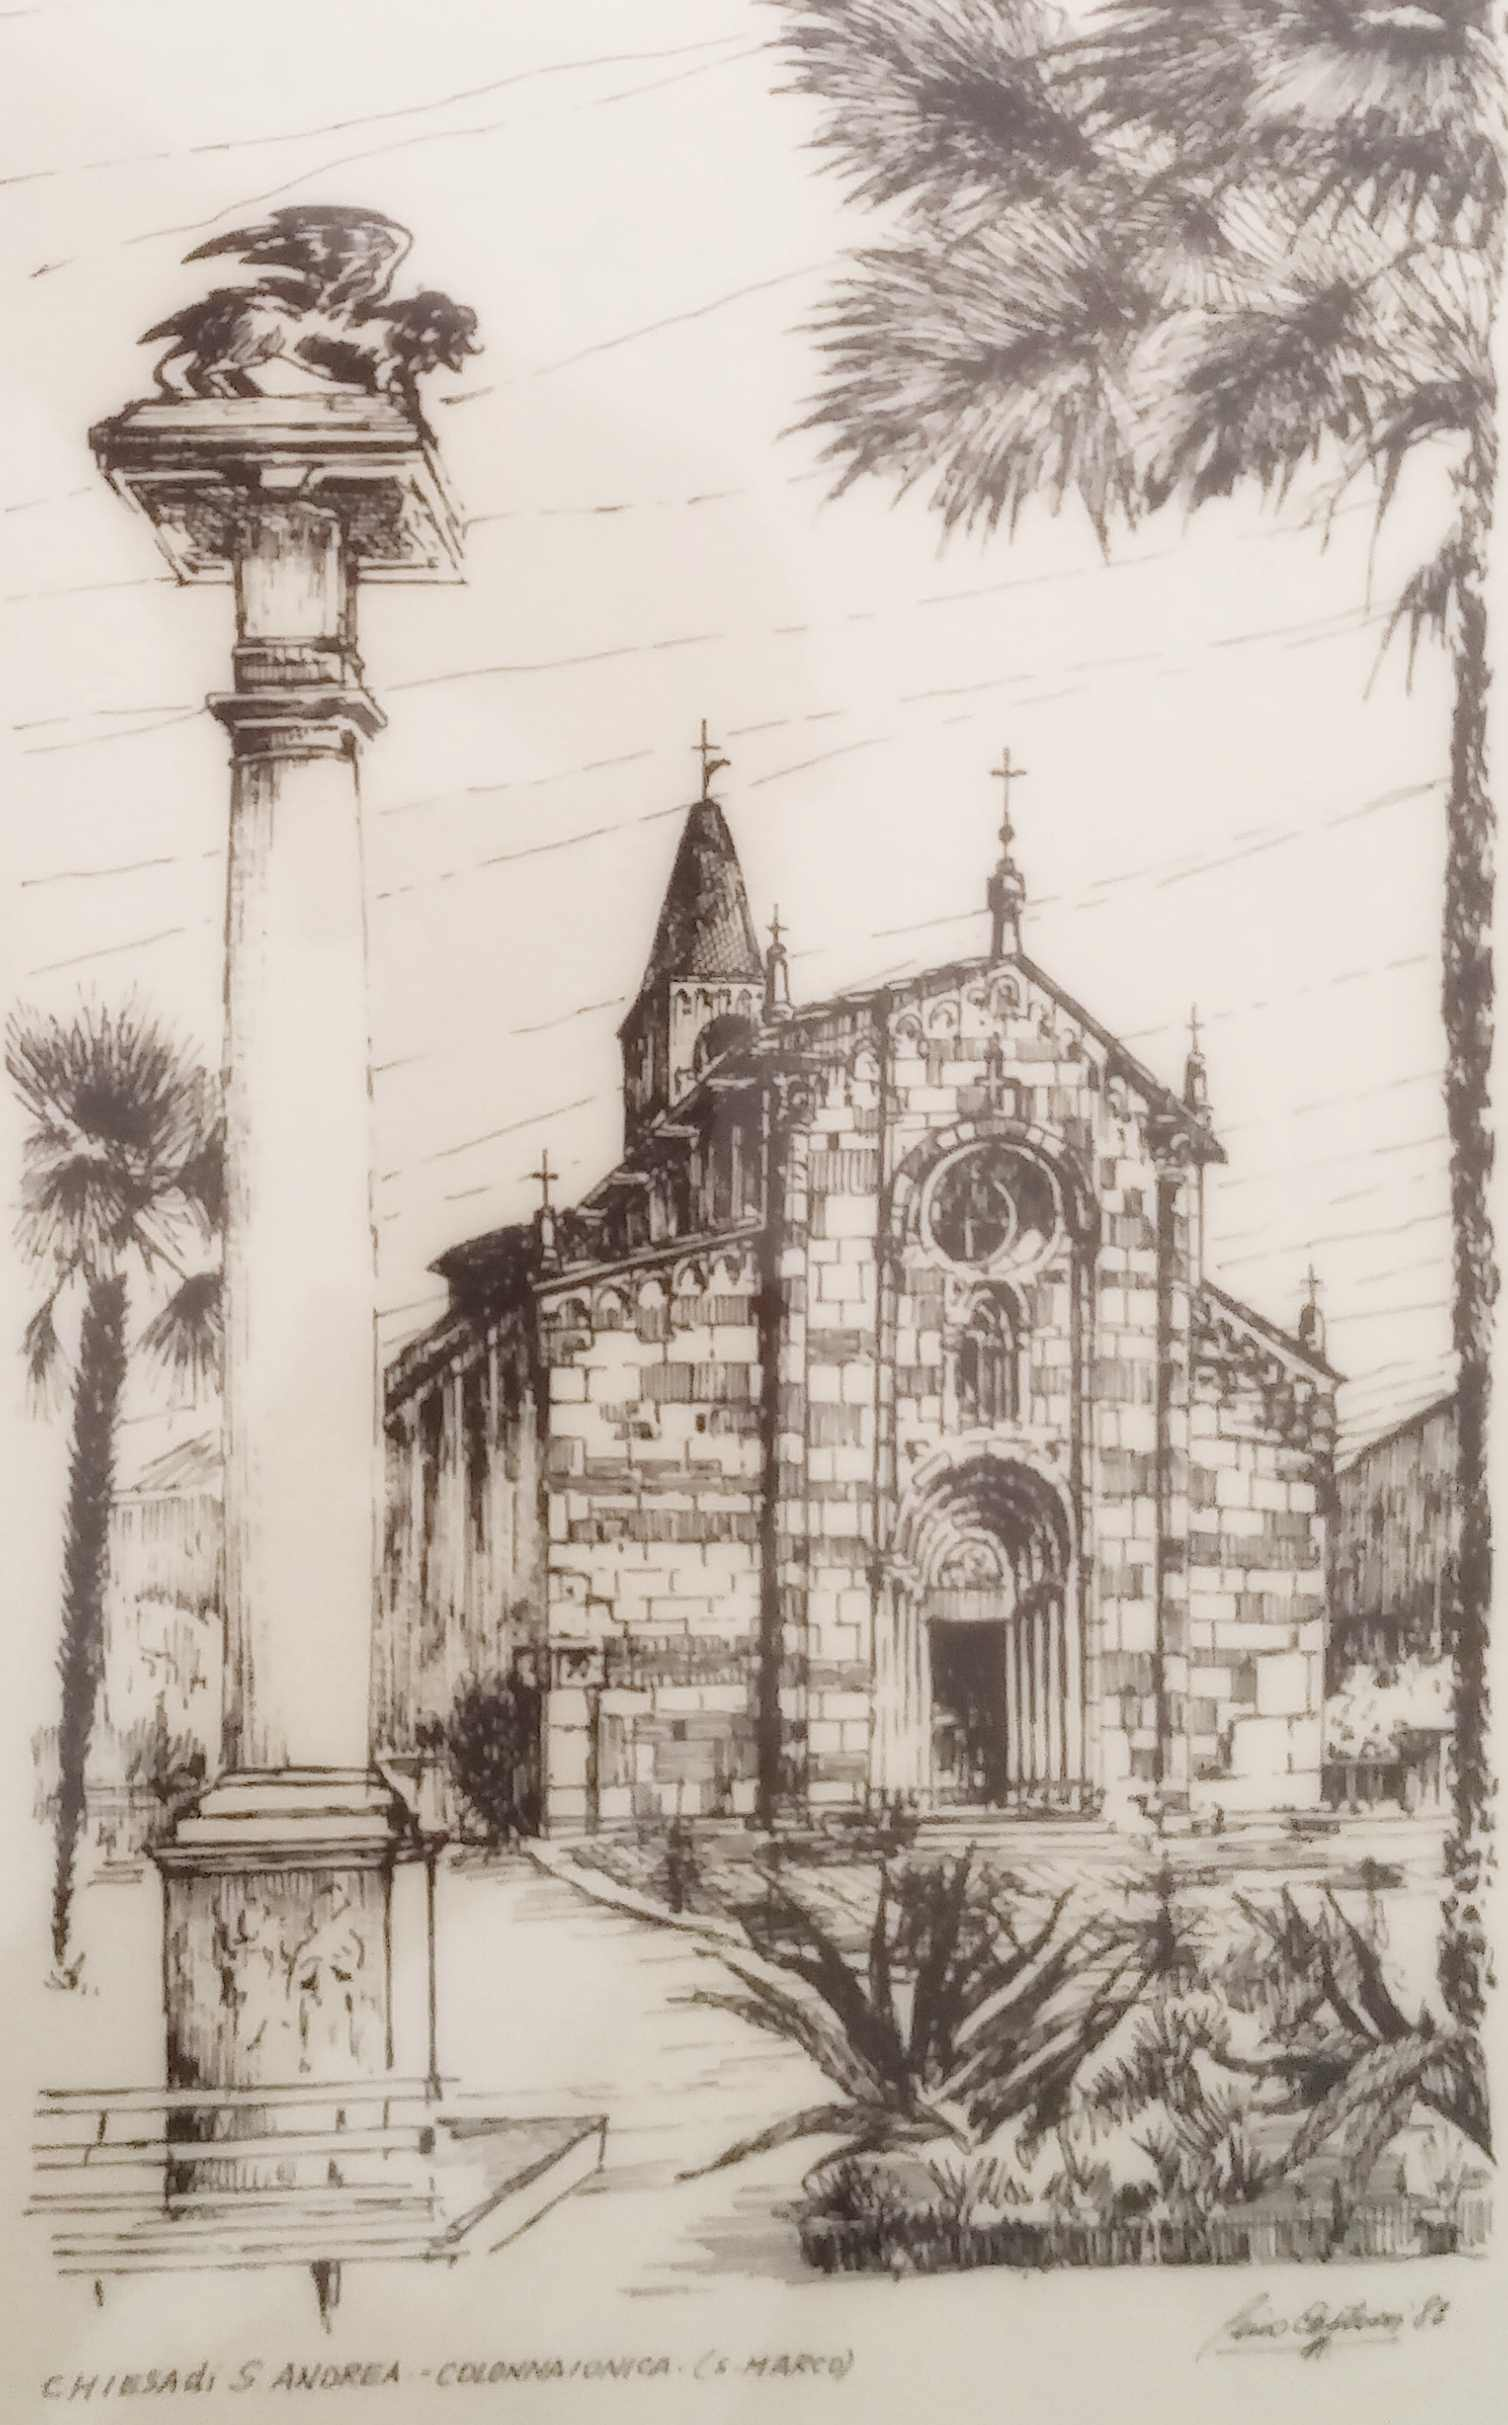 Chiesa di sant Andrea